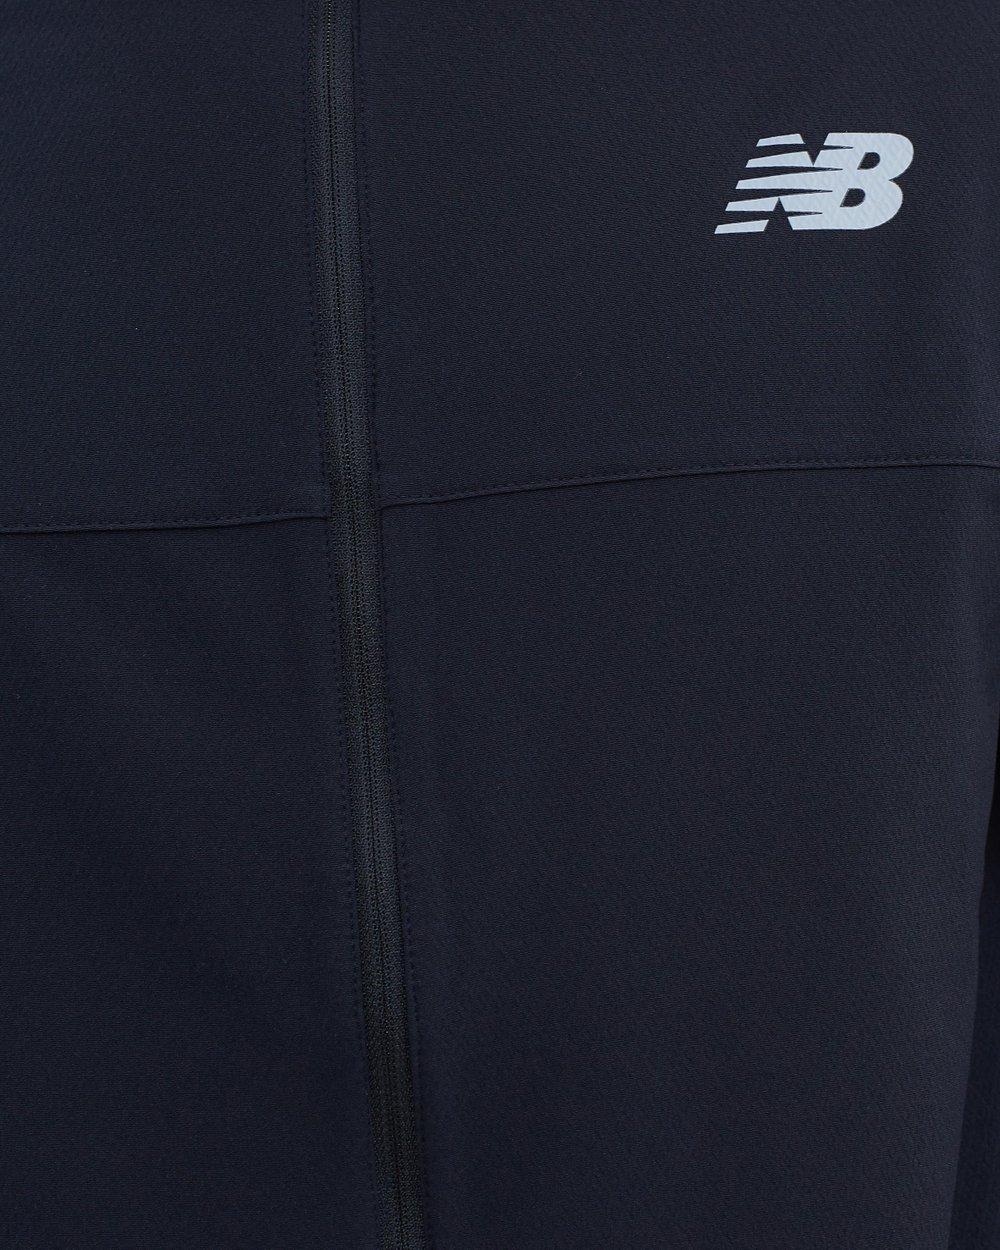 6dff7c403 Tenacity Woven Jacket